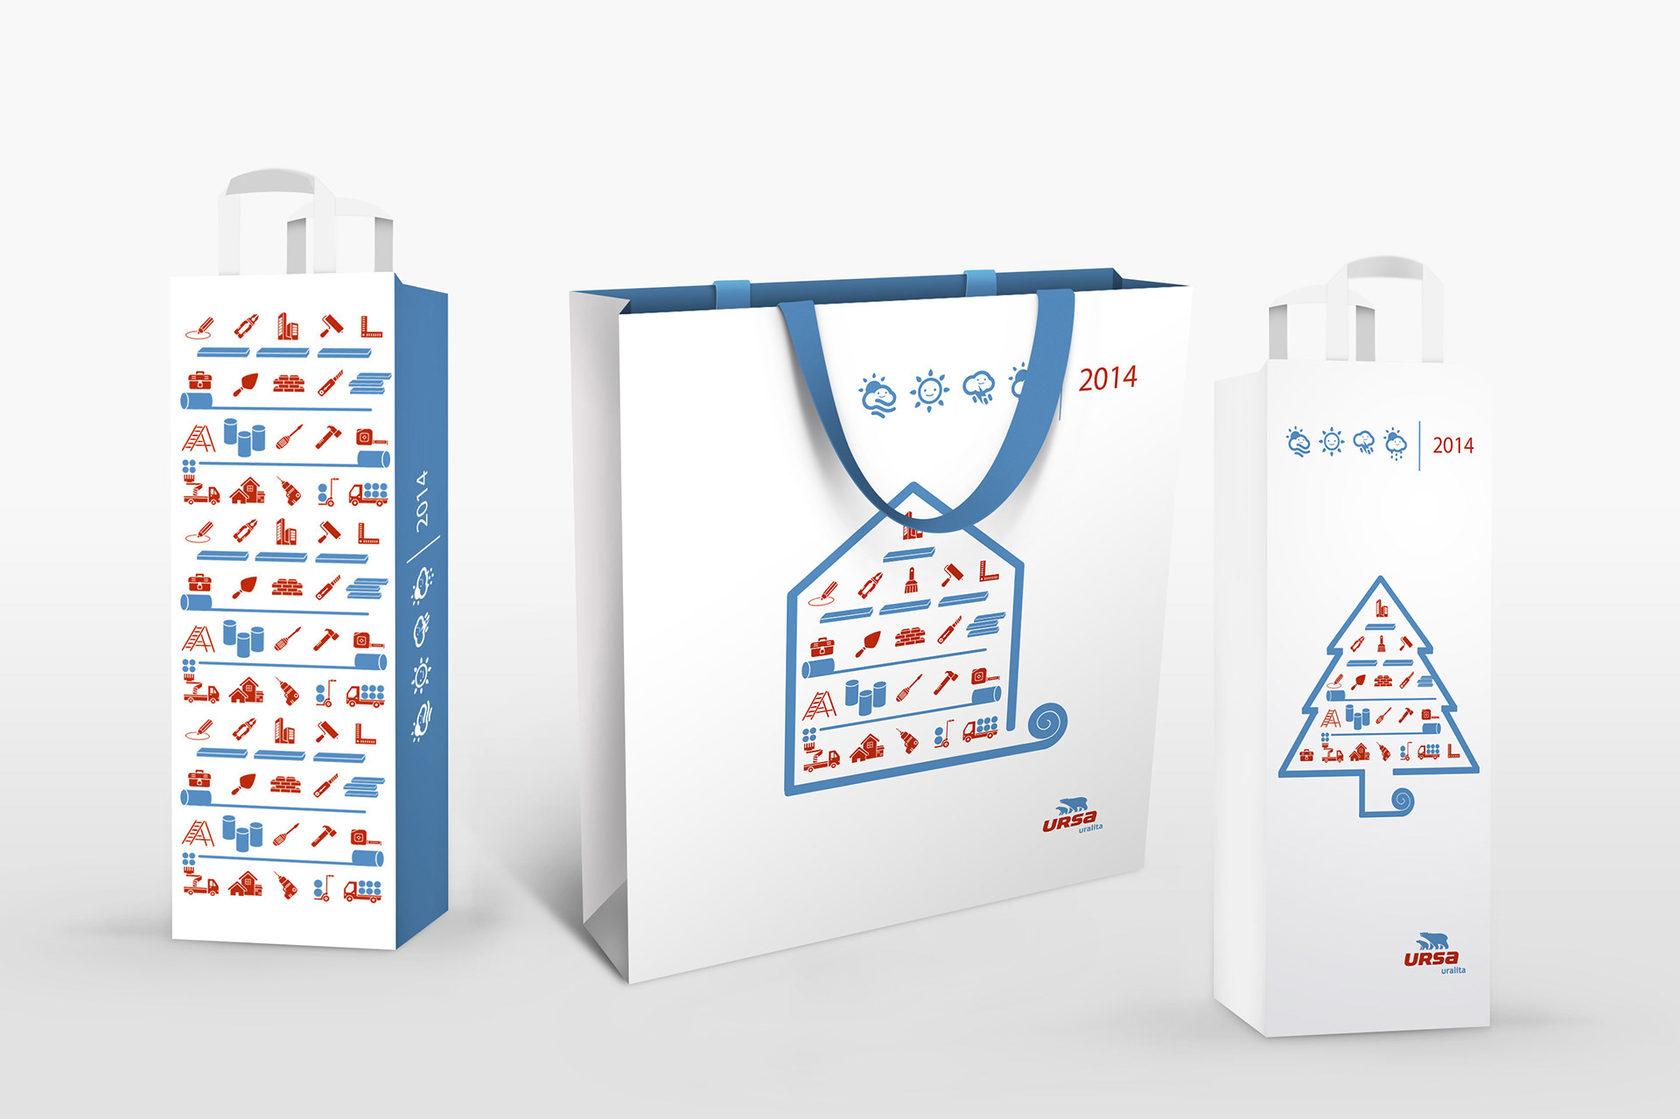 Упаковка с логотипами и открытка